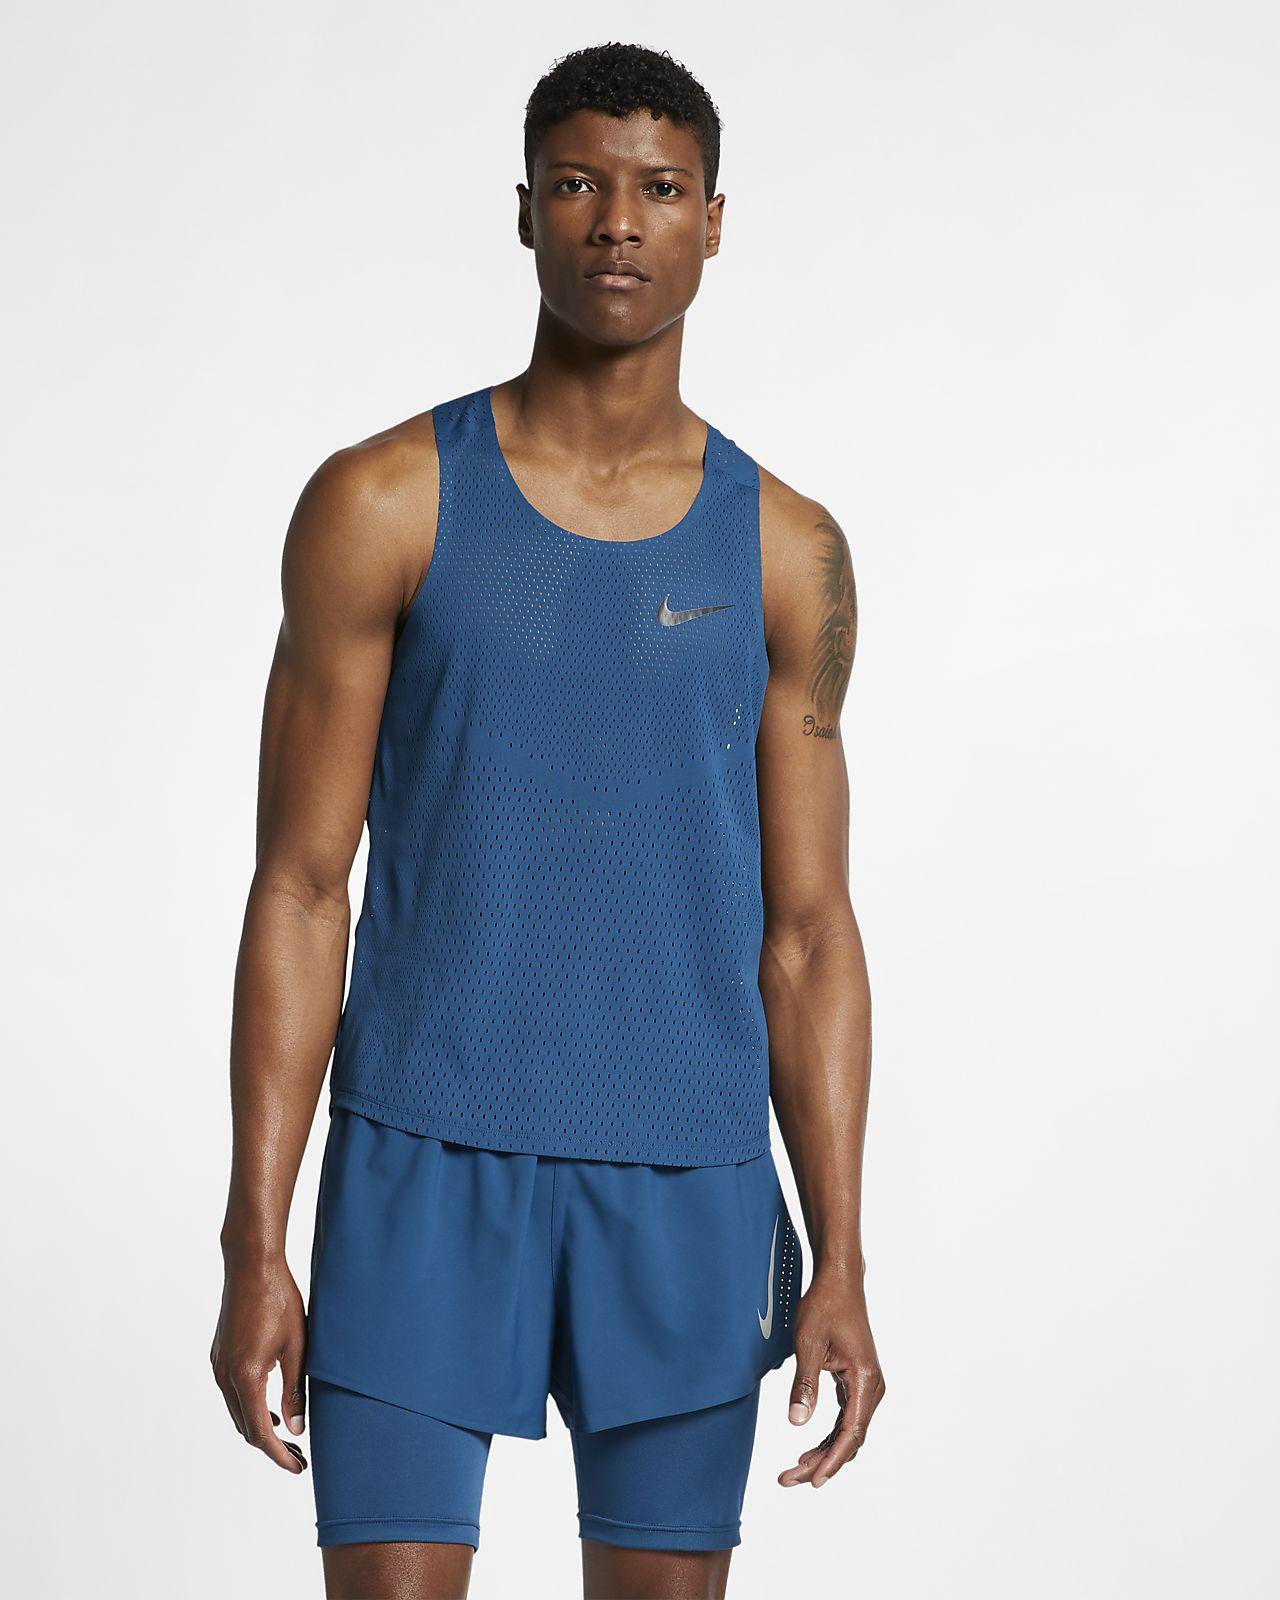 Canottiera da running Nike AeroSwift - Uomo